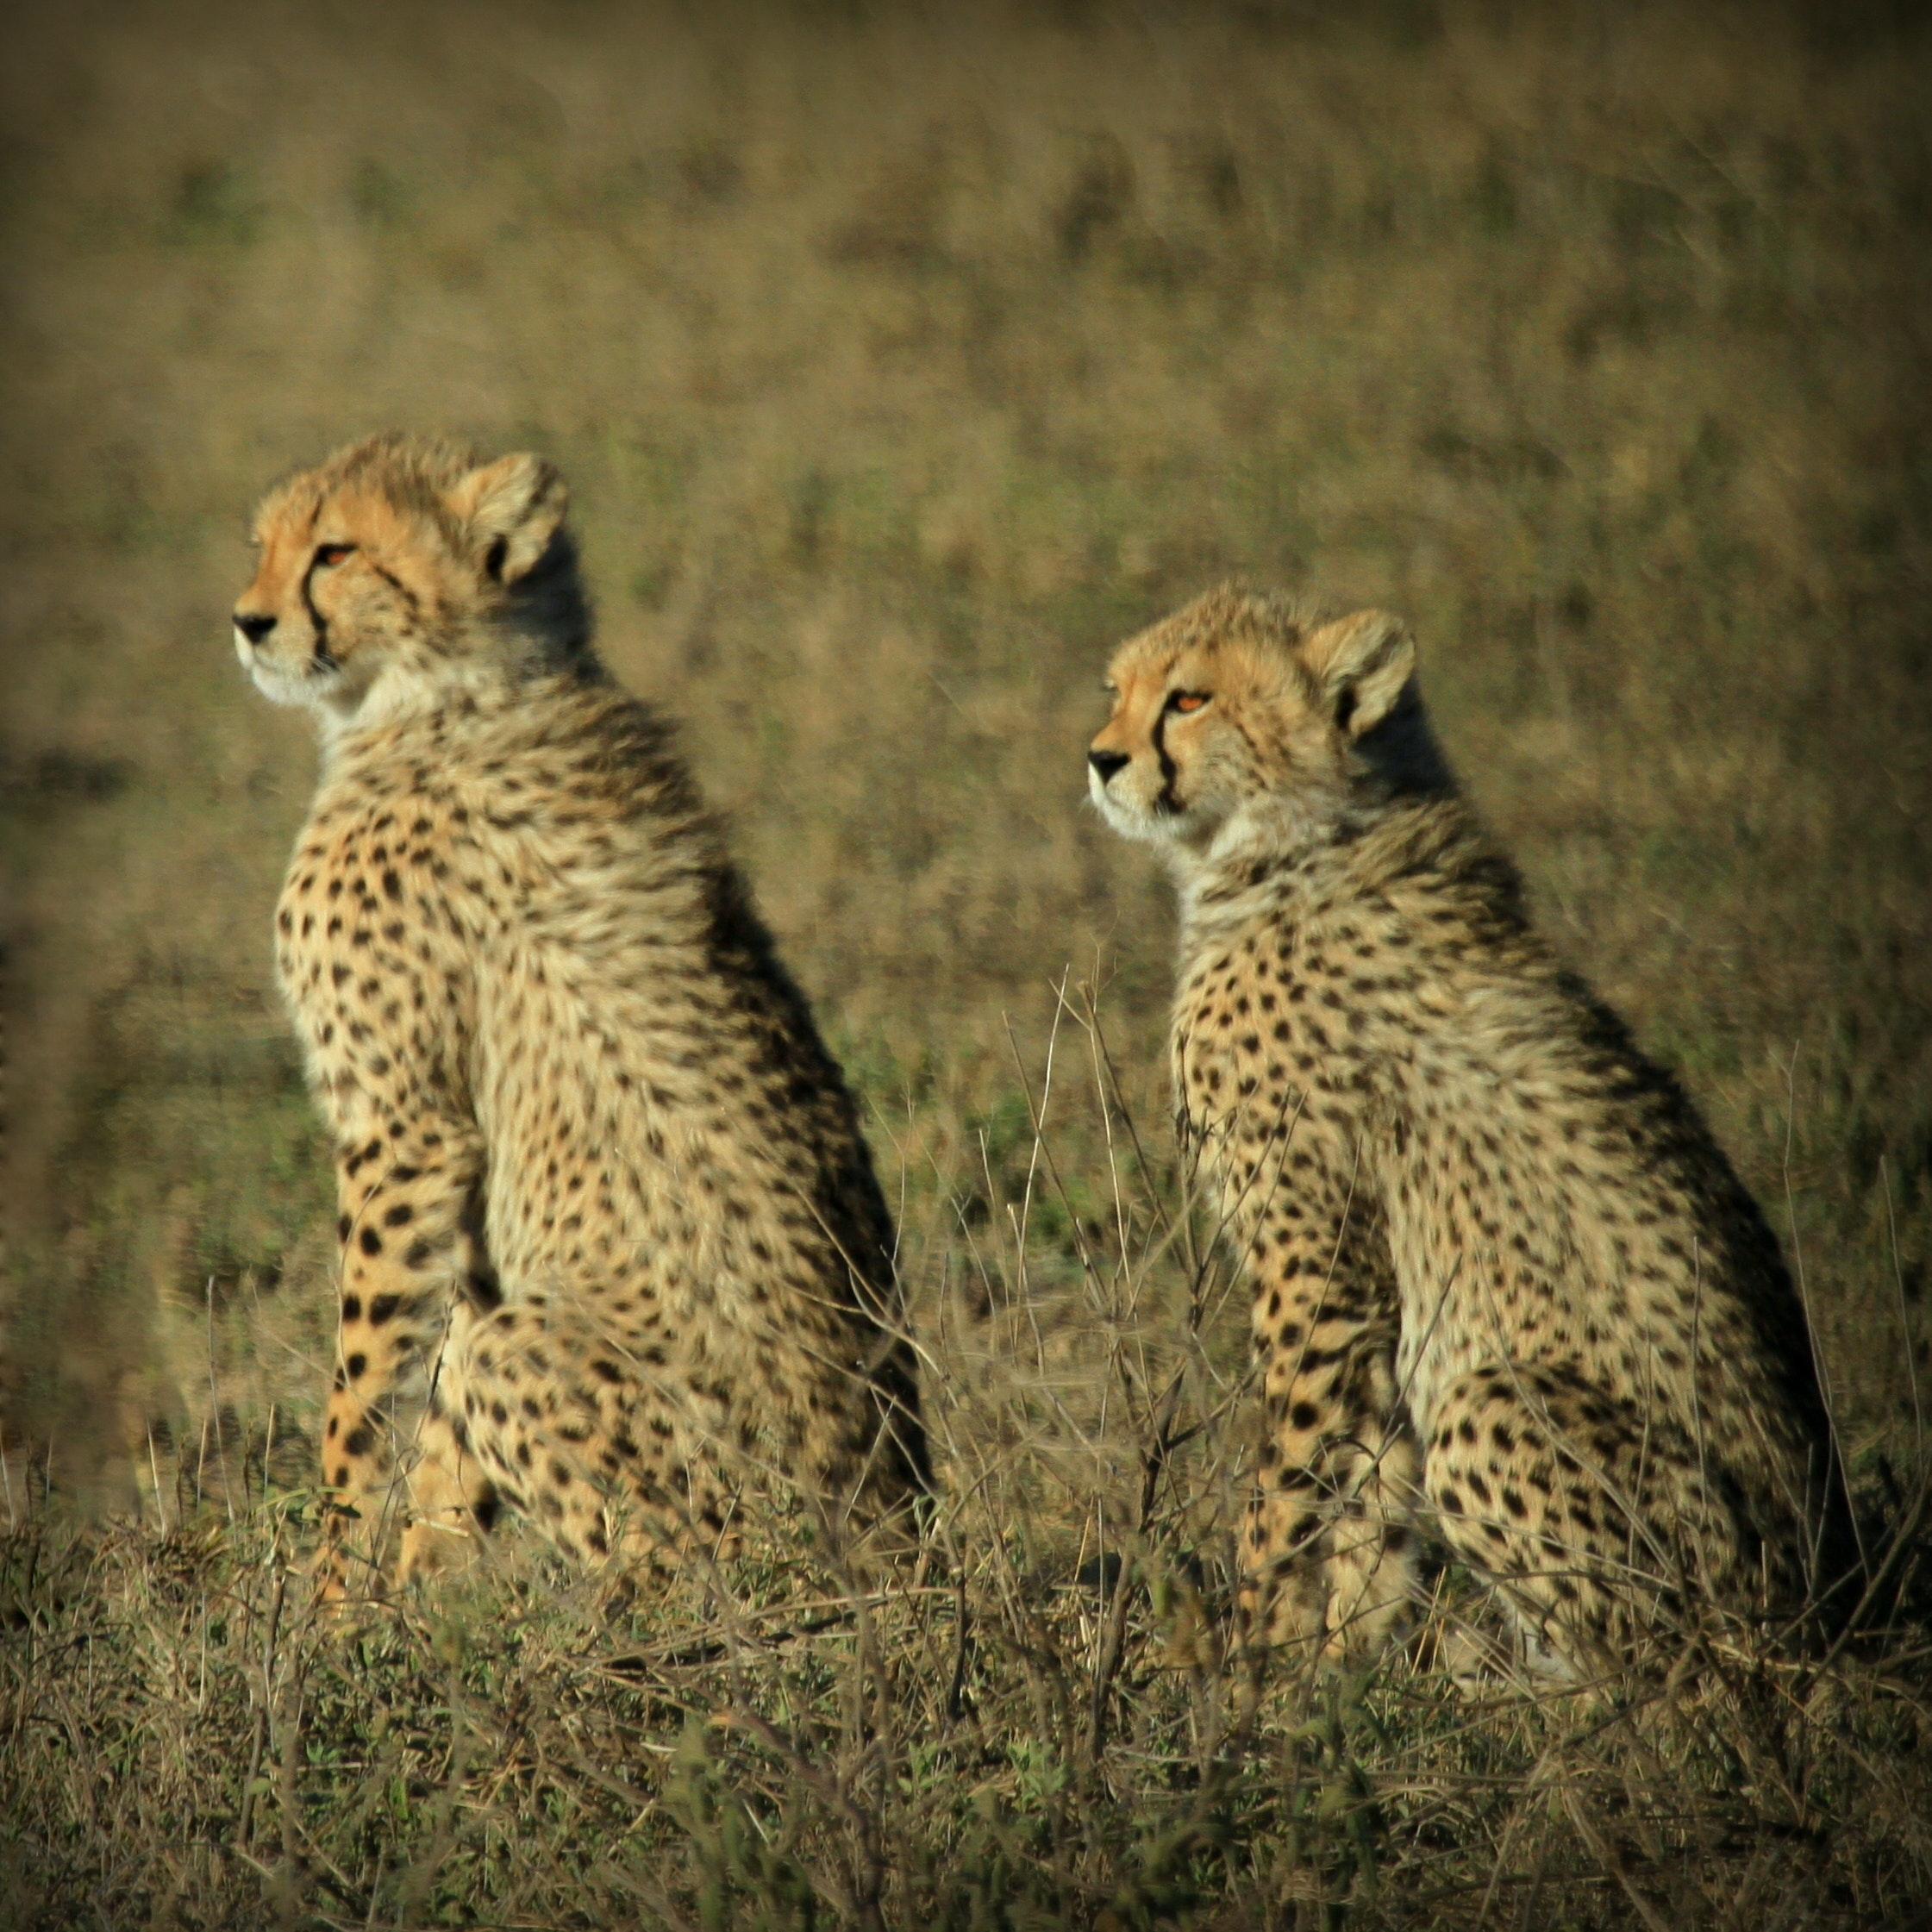 Cheetah hunting and gazing stock video footage storyblocks video.